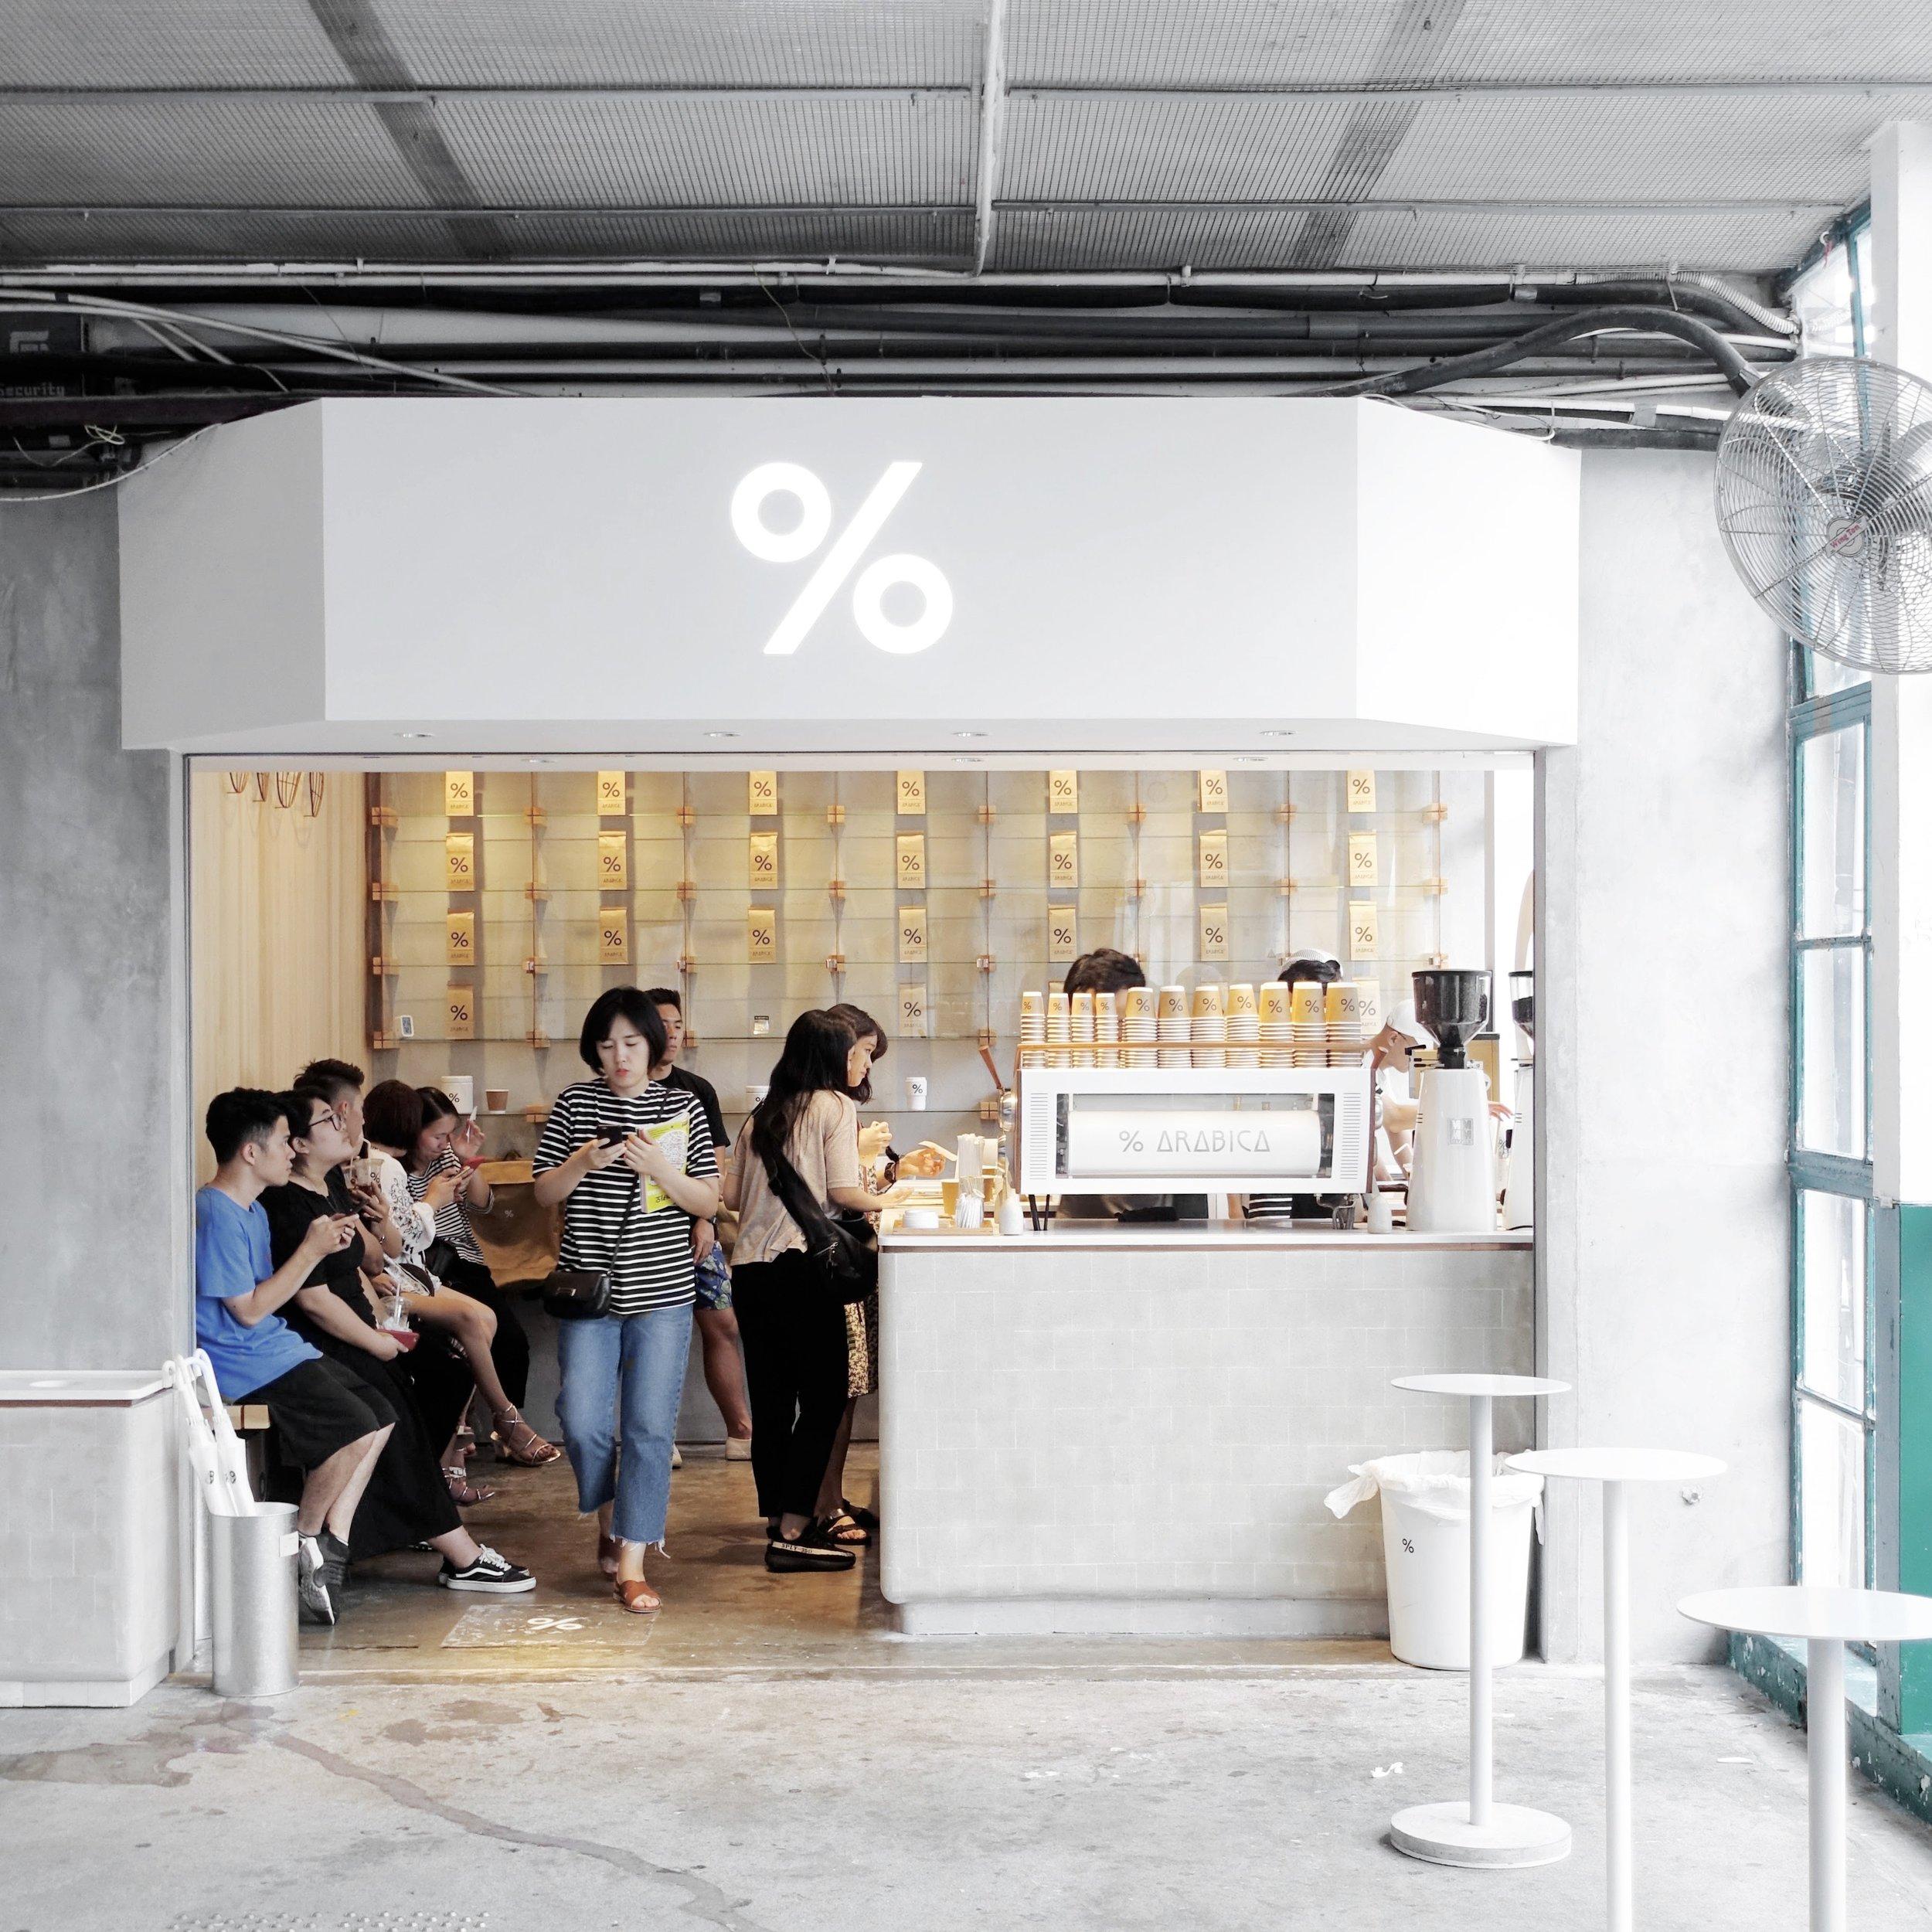 % Arabica in Hong Kong  Source